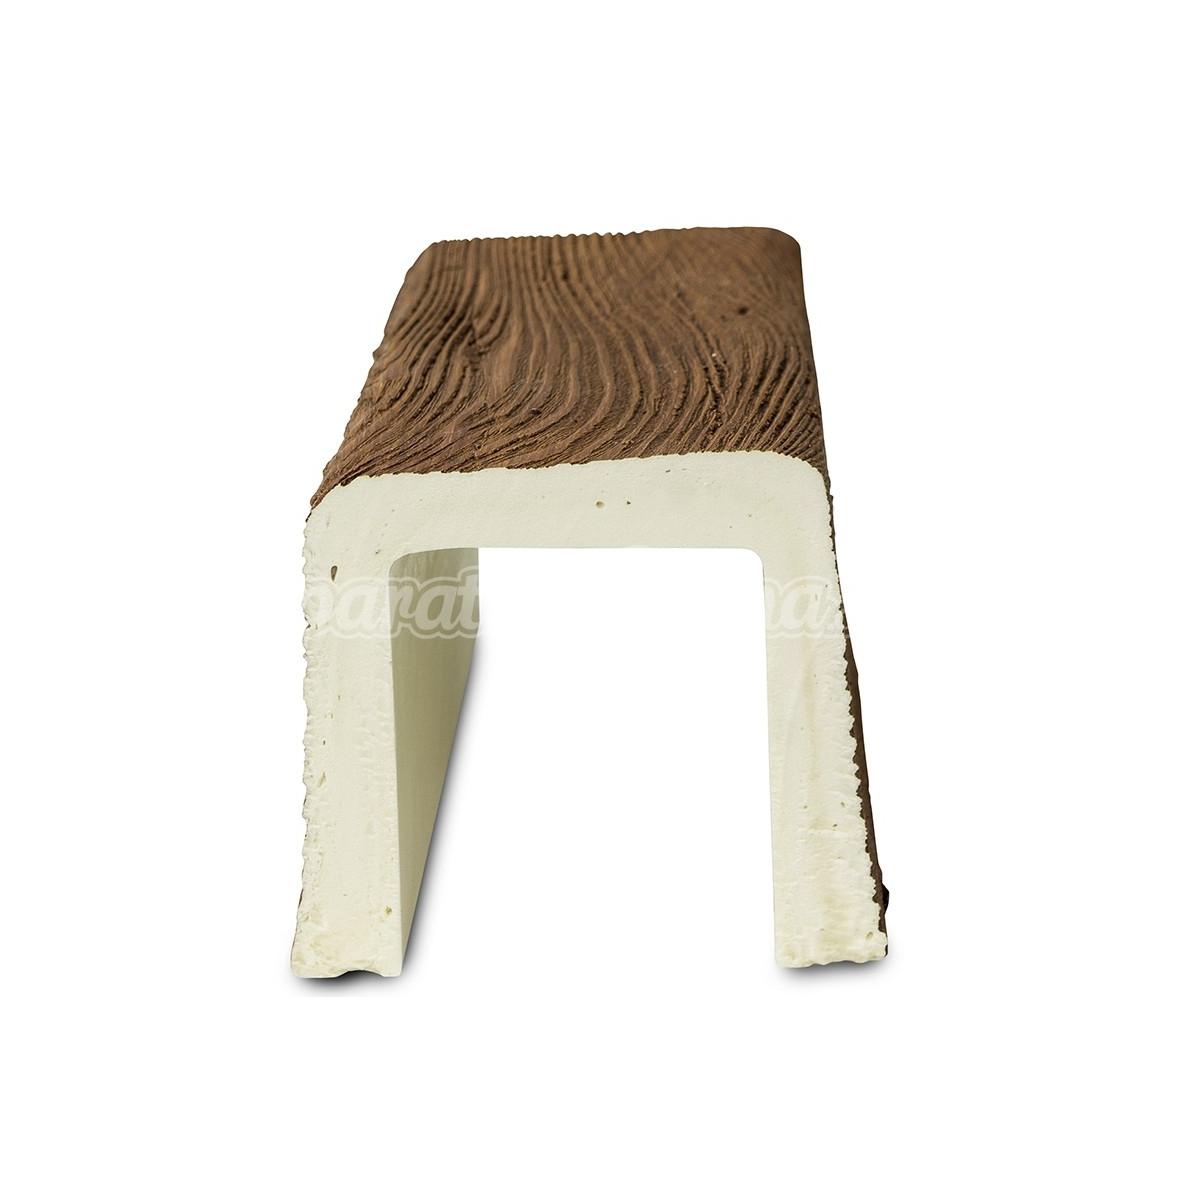 Viga imitación a madera 300x12x12 Grupo Unamacor